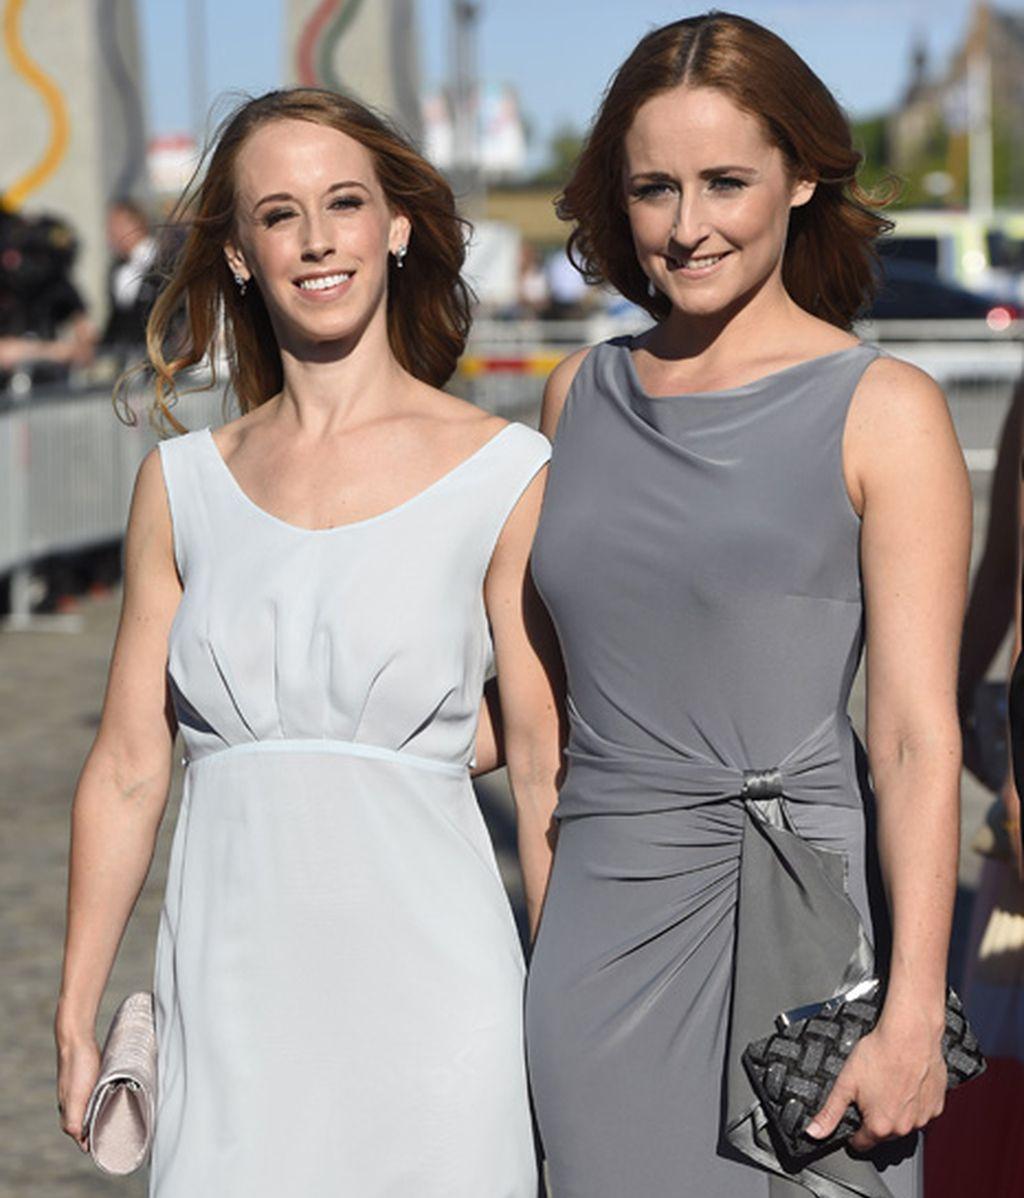 Las hermanas de la novia, las pizpiretas Sara y Lina Helkvist